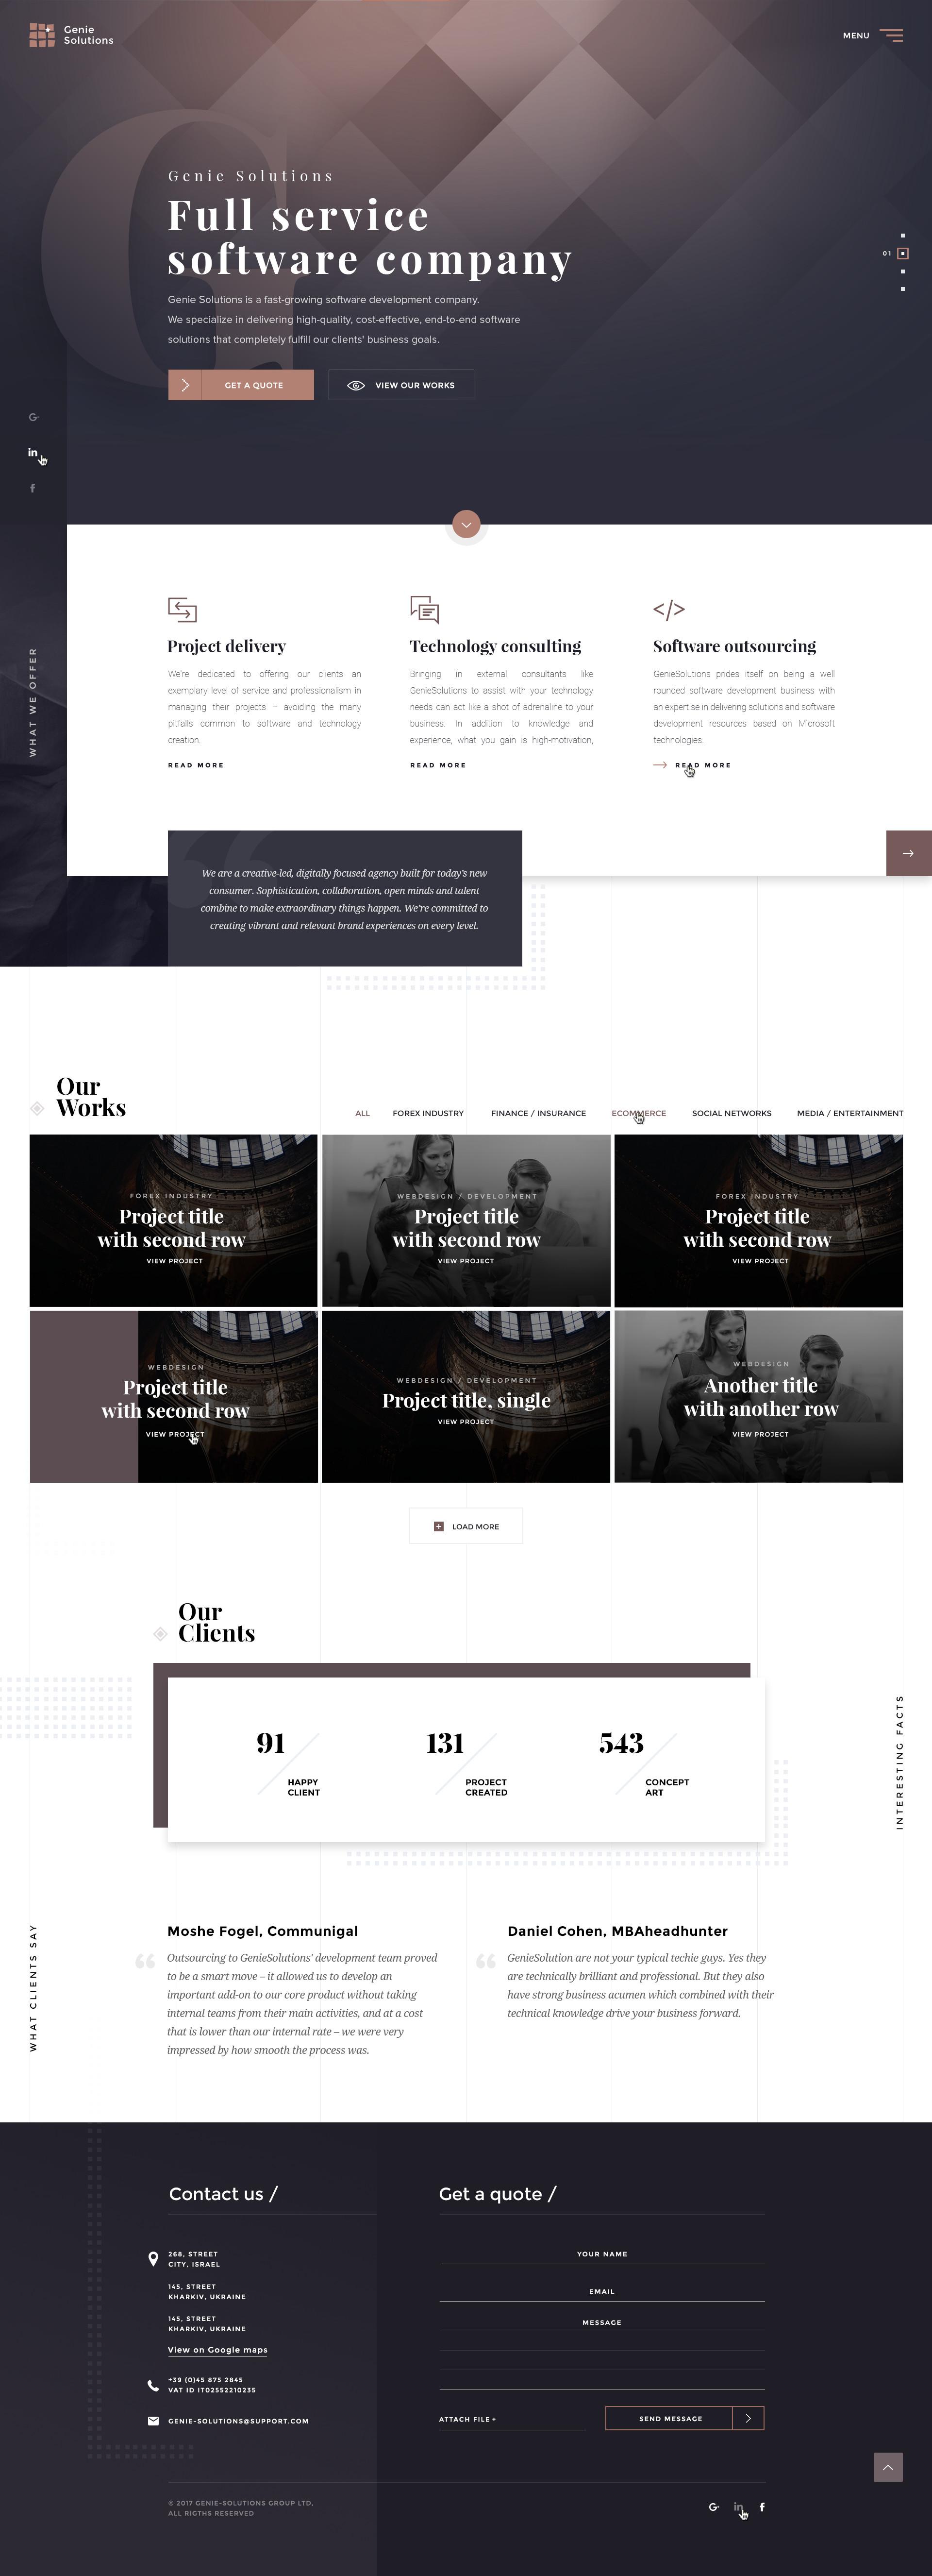 Software company homepage